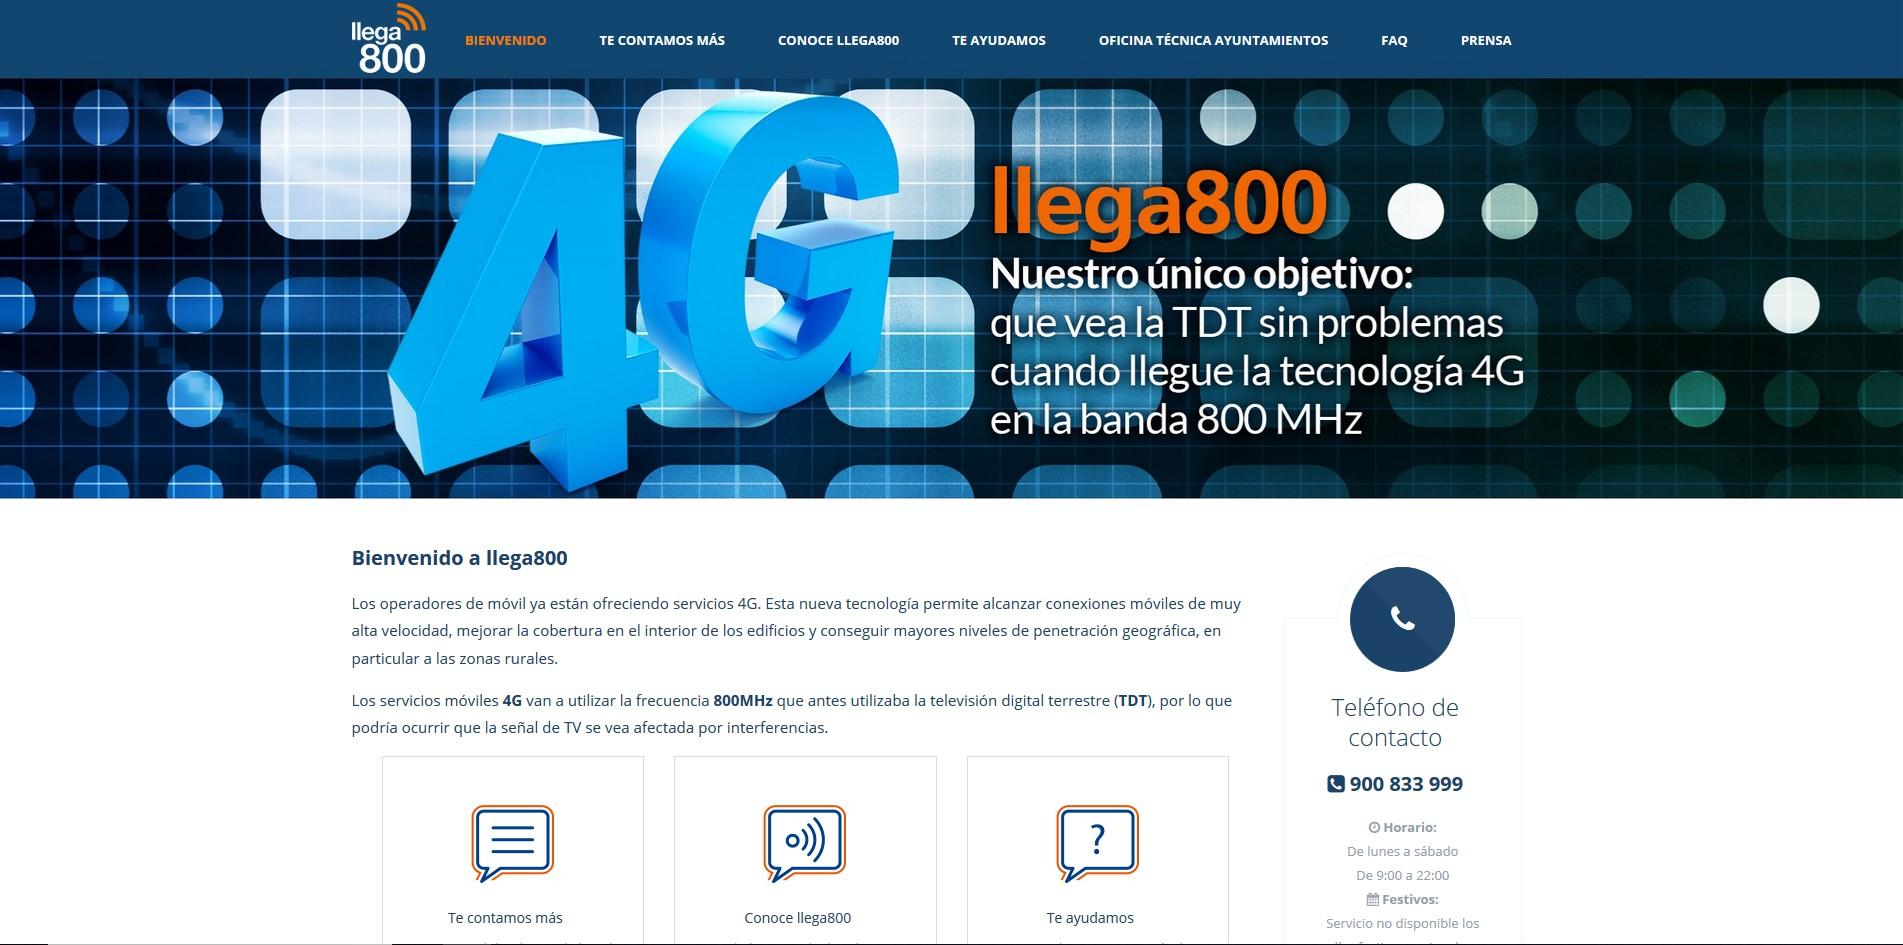 Llega800